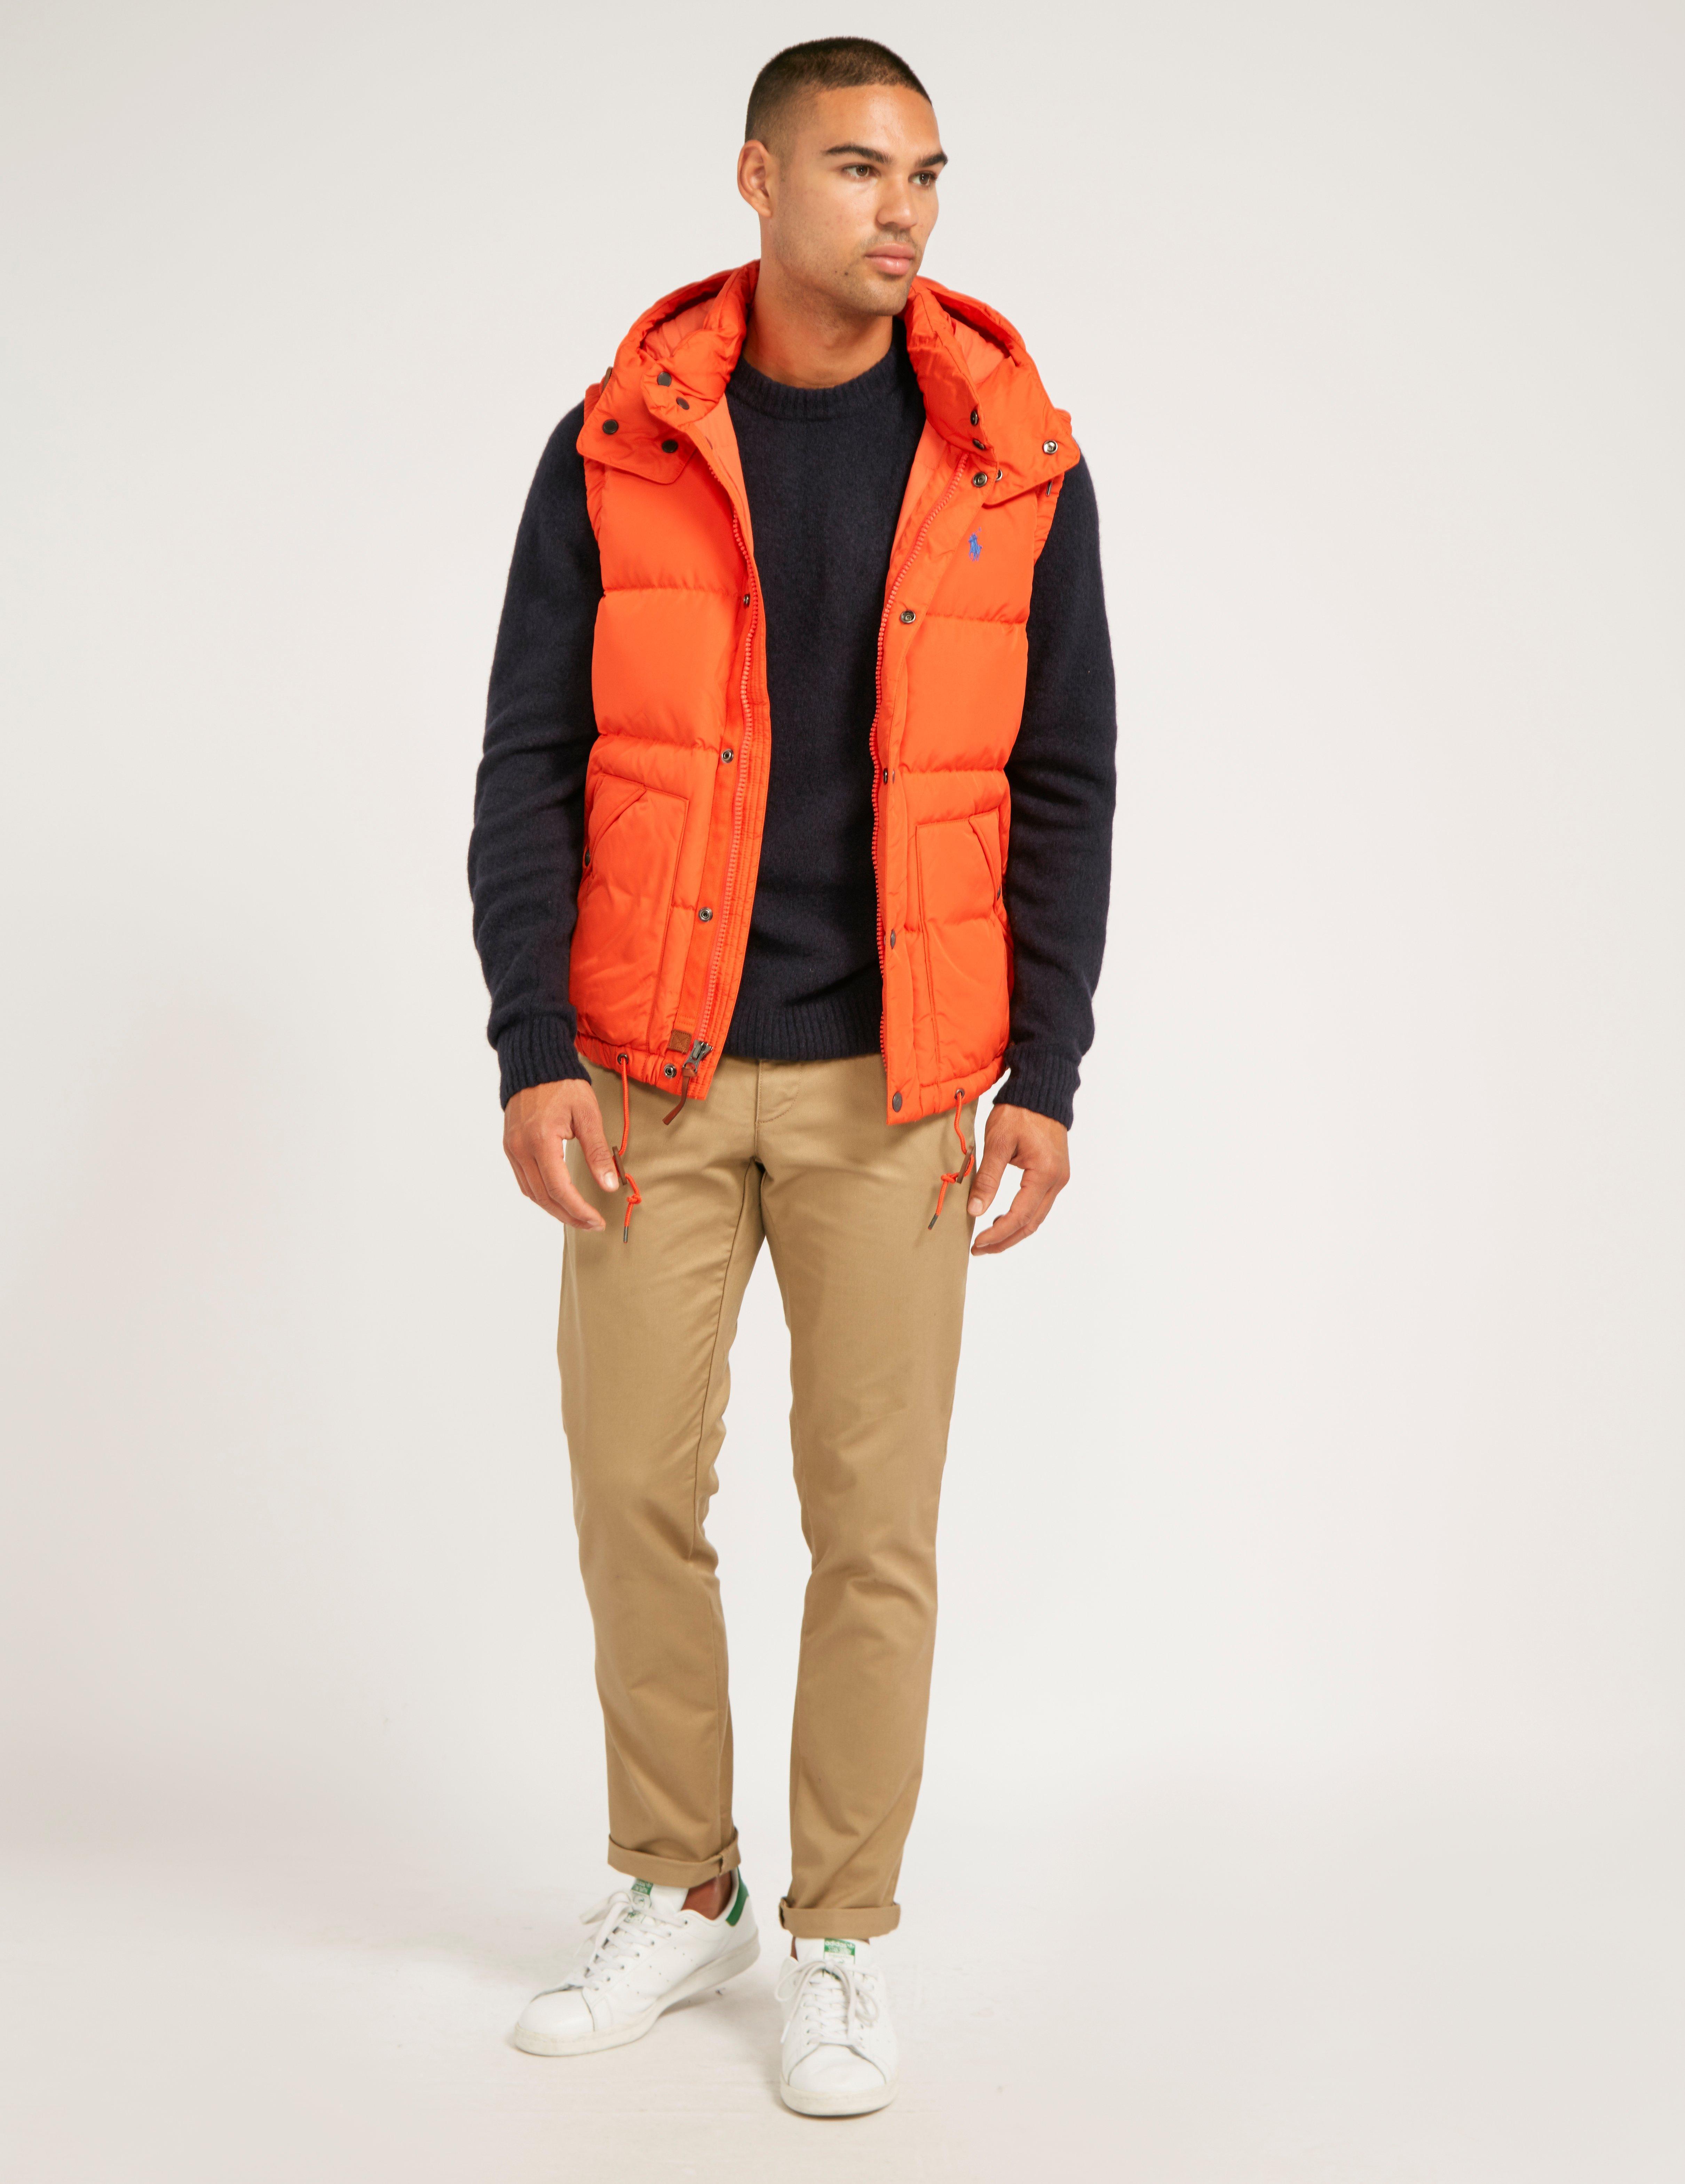 lyst polo ralph lauren gilet in orange for men. Black Bedroom Furniture Sets. Home Design Ideas